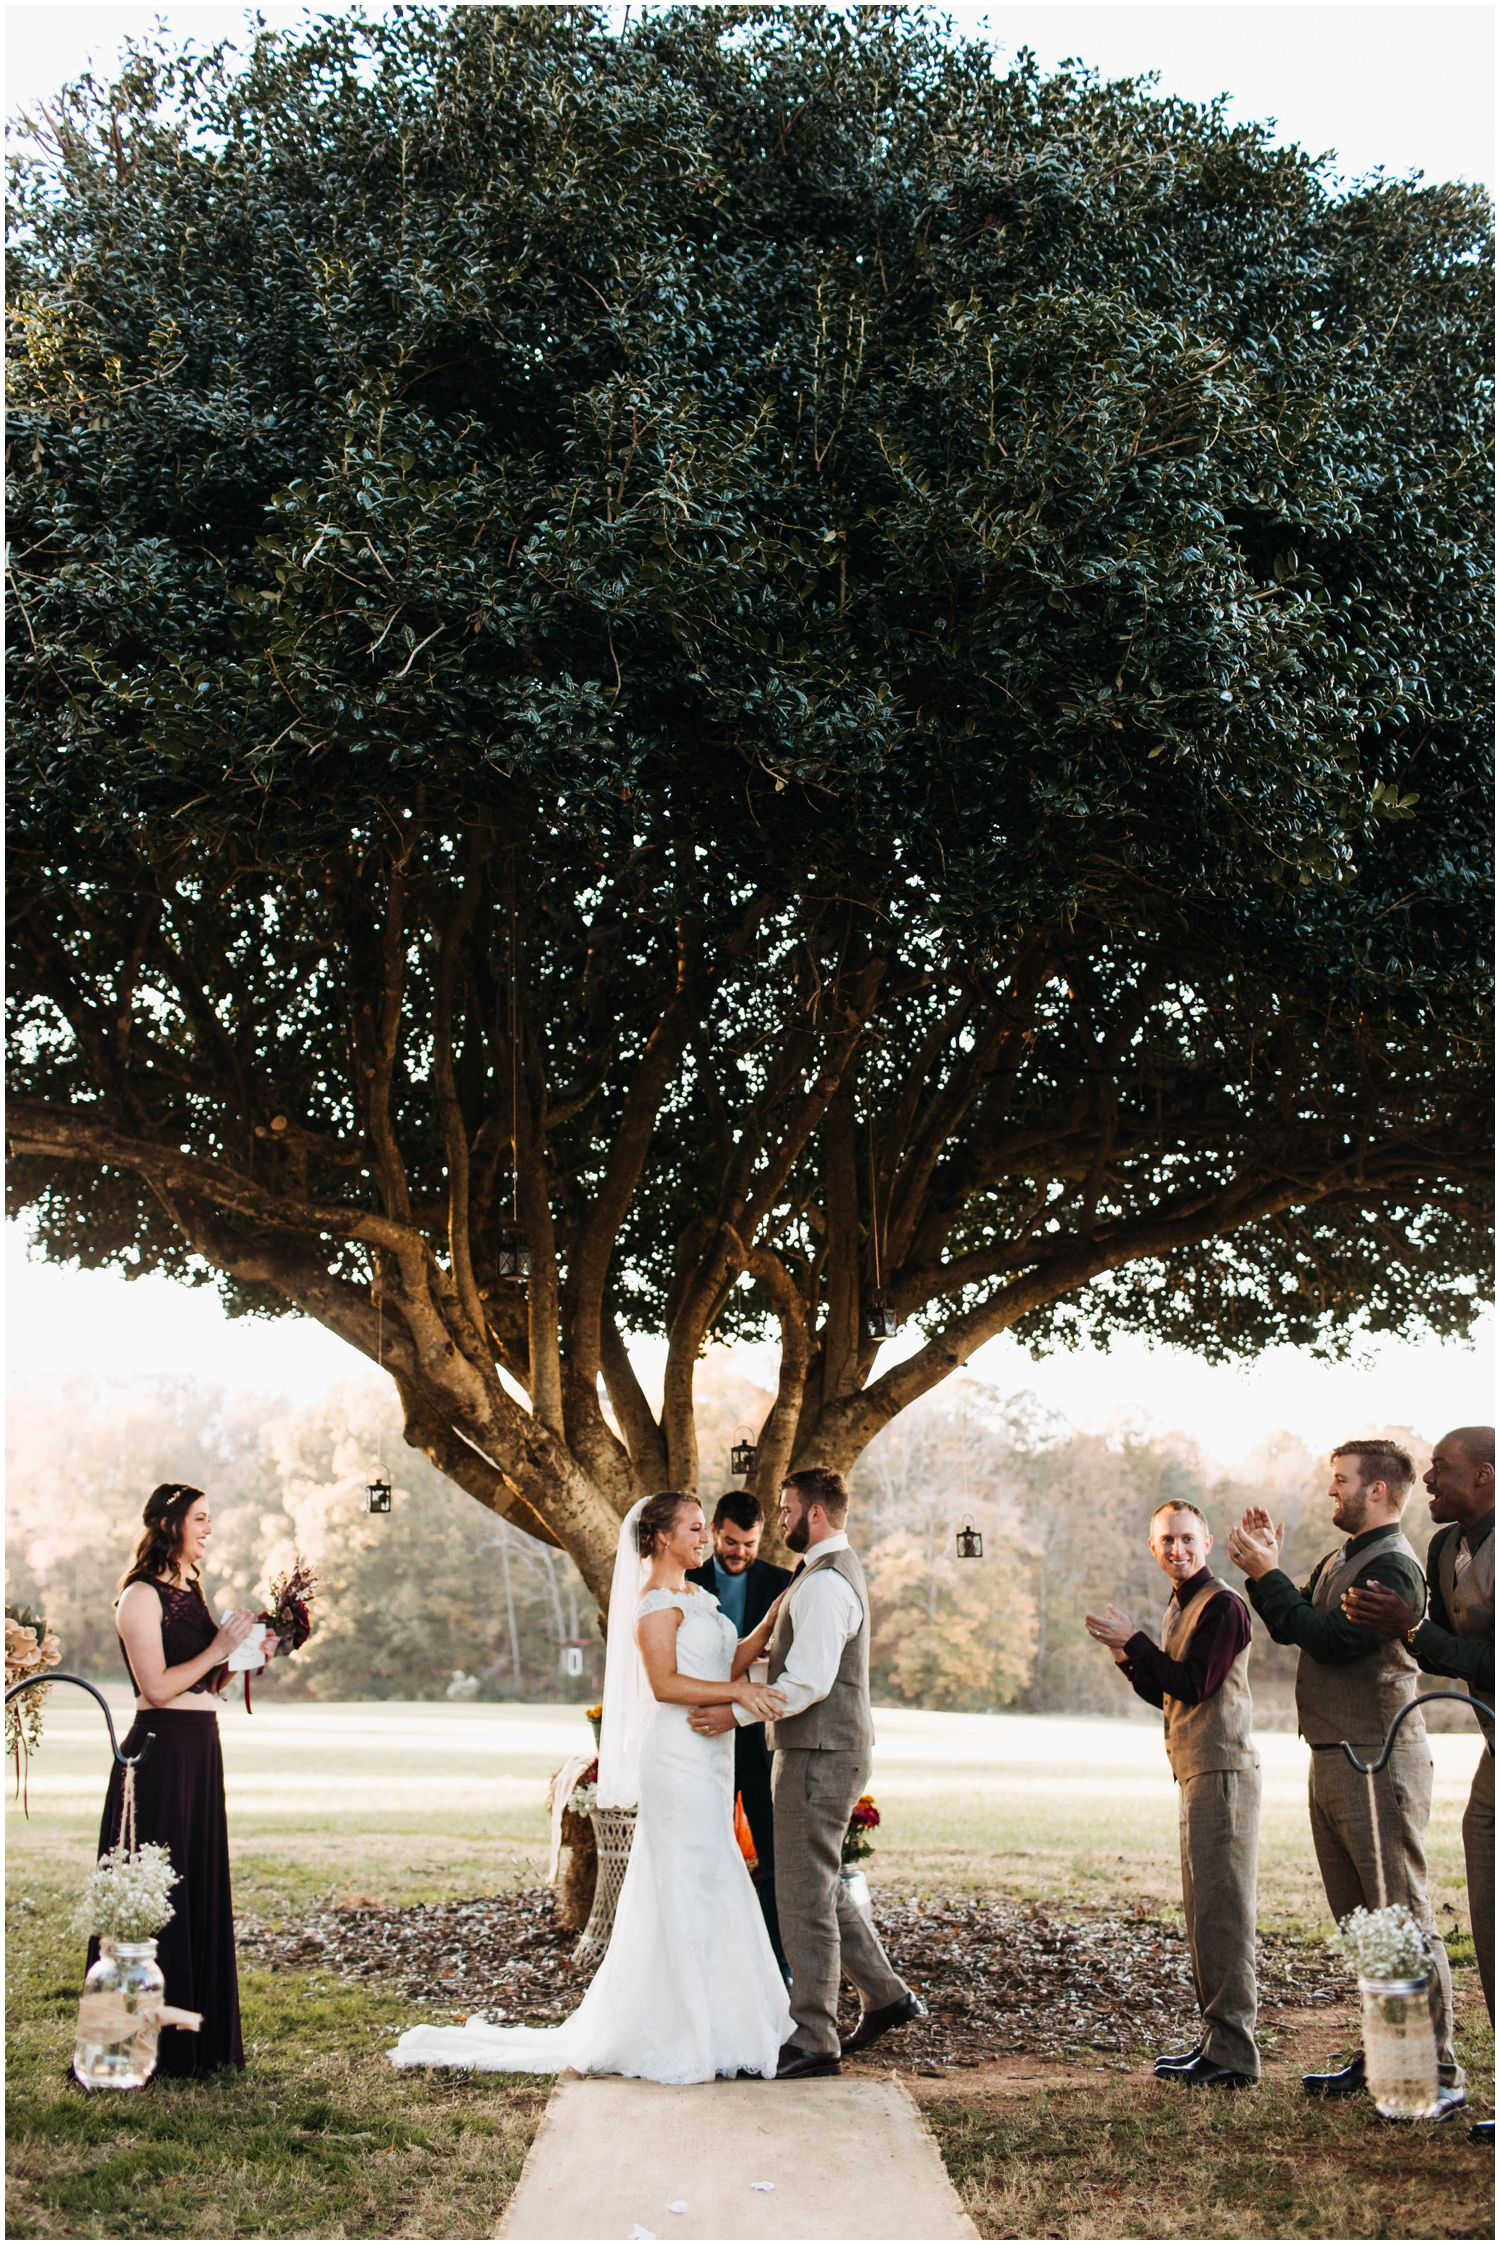 Jess+Dan_rustic_southern_farm_fall_wedding_charlotte_north carolina_taylor powers_0196.jpg